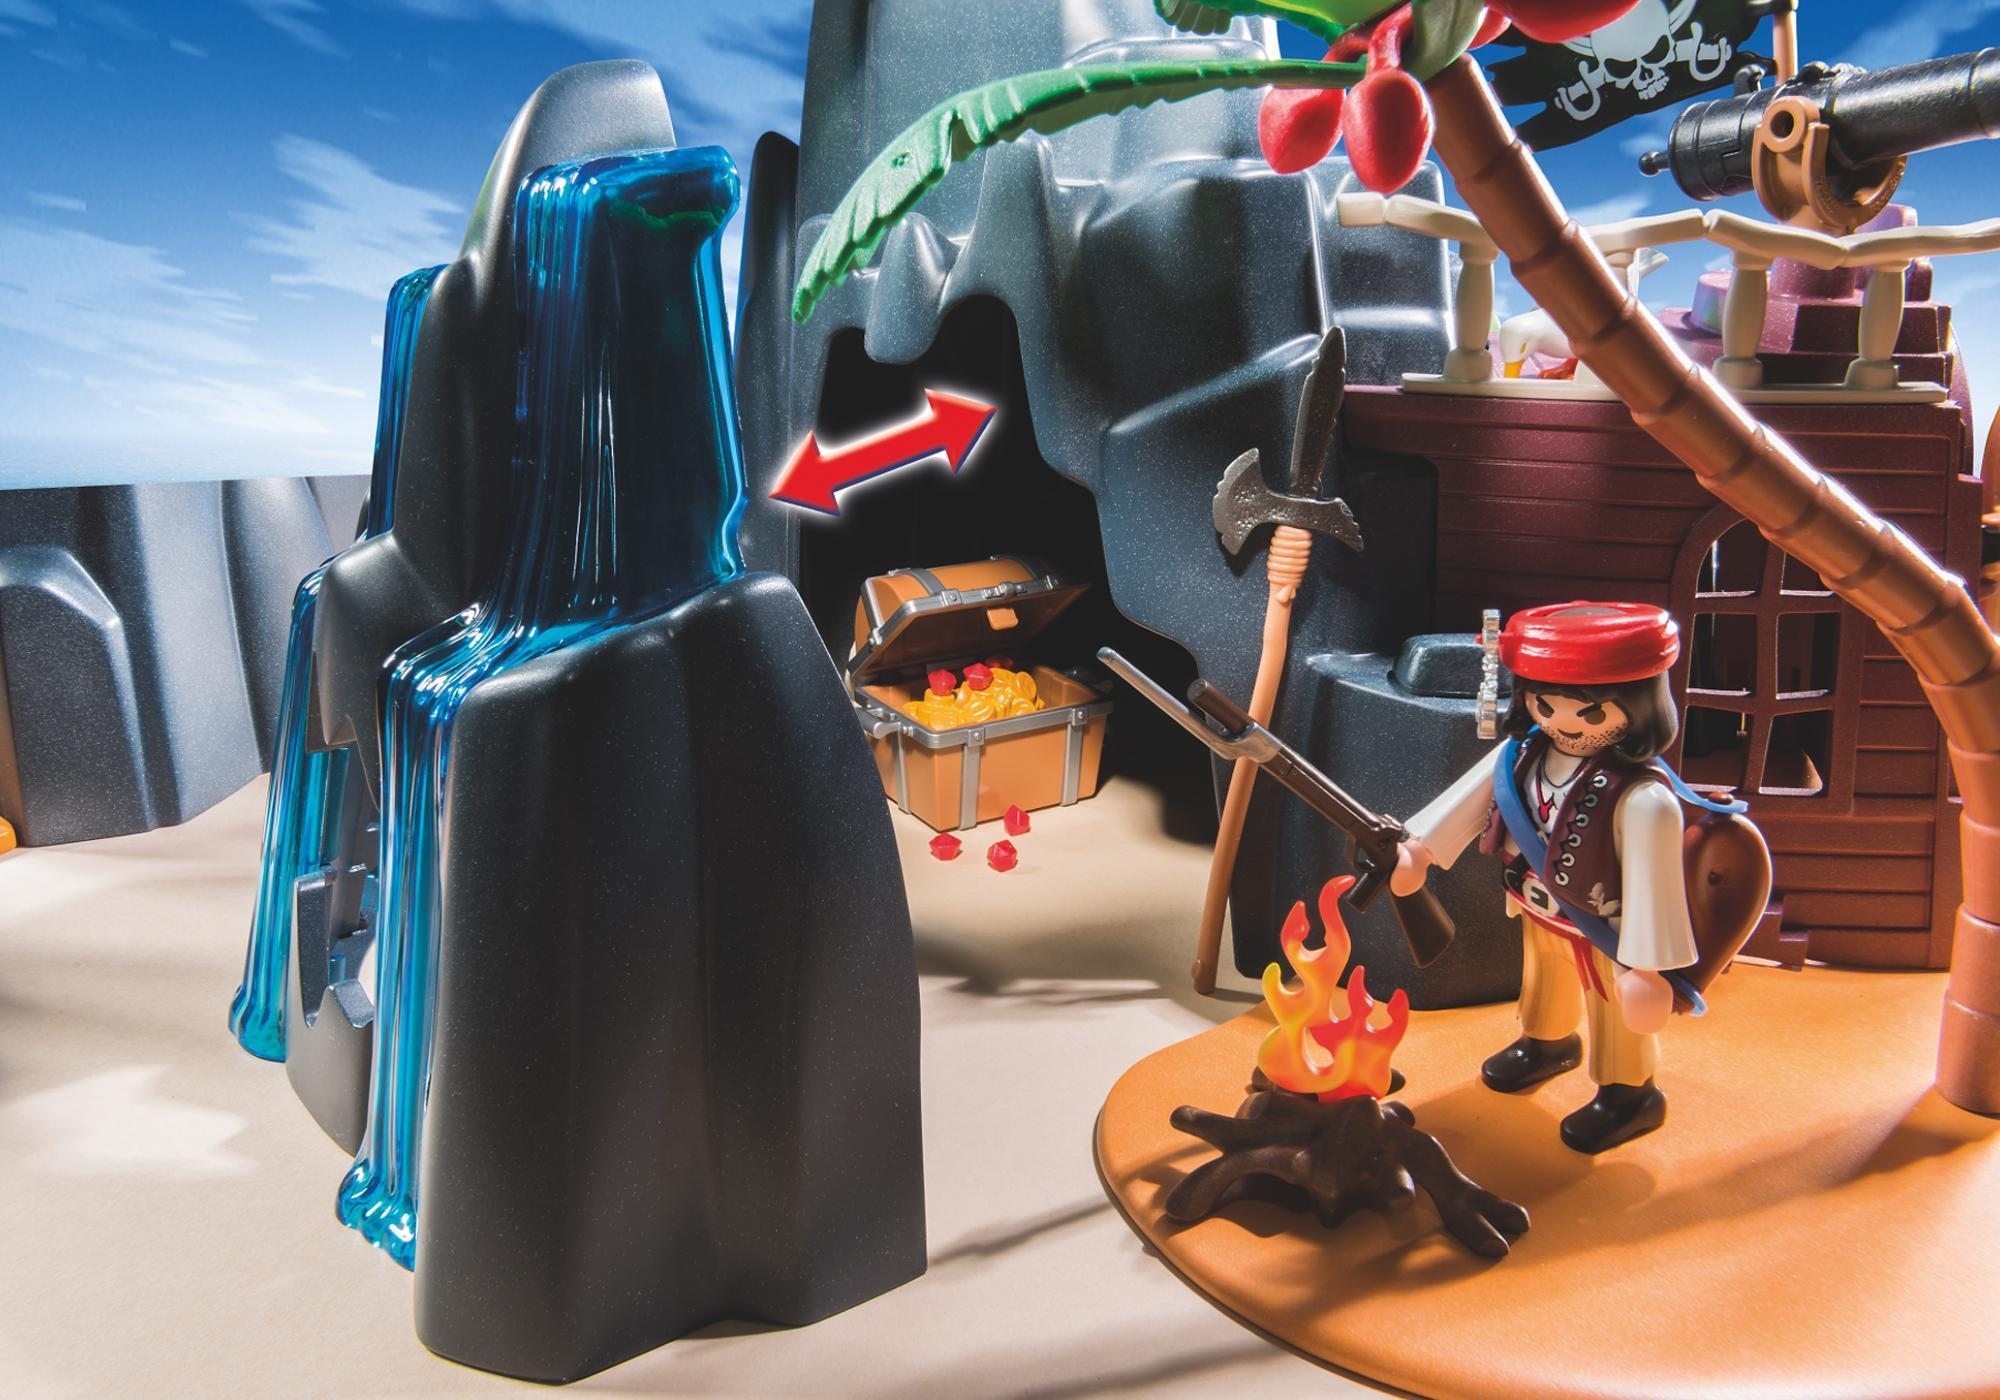 http://media.playmobil.com/i/playmobil/6679_product_extra1/Piraten-Schatzinsel